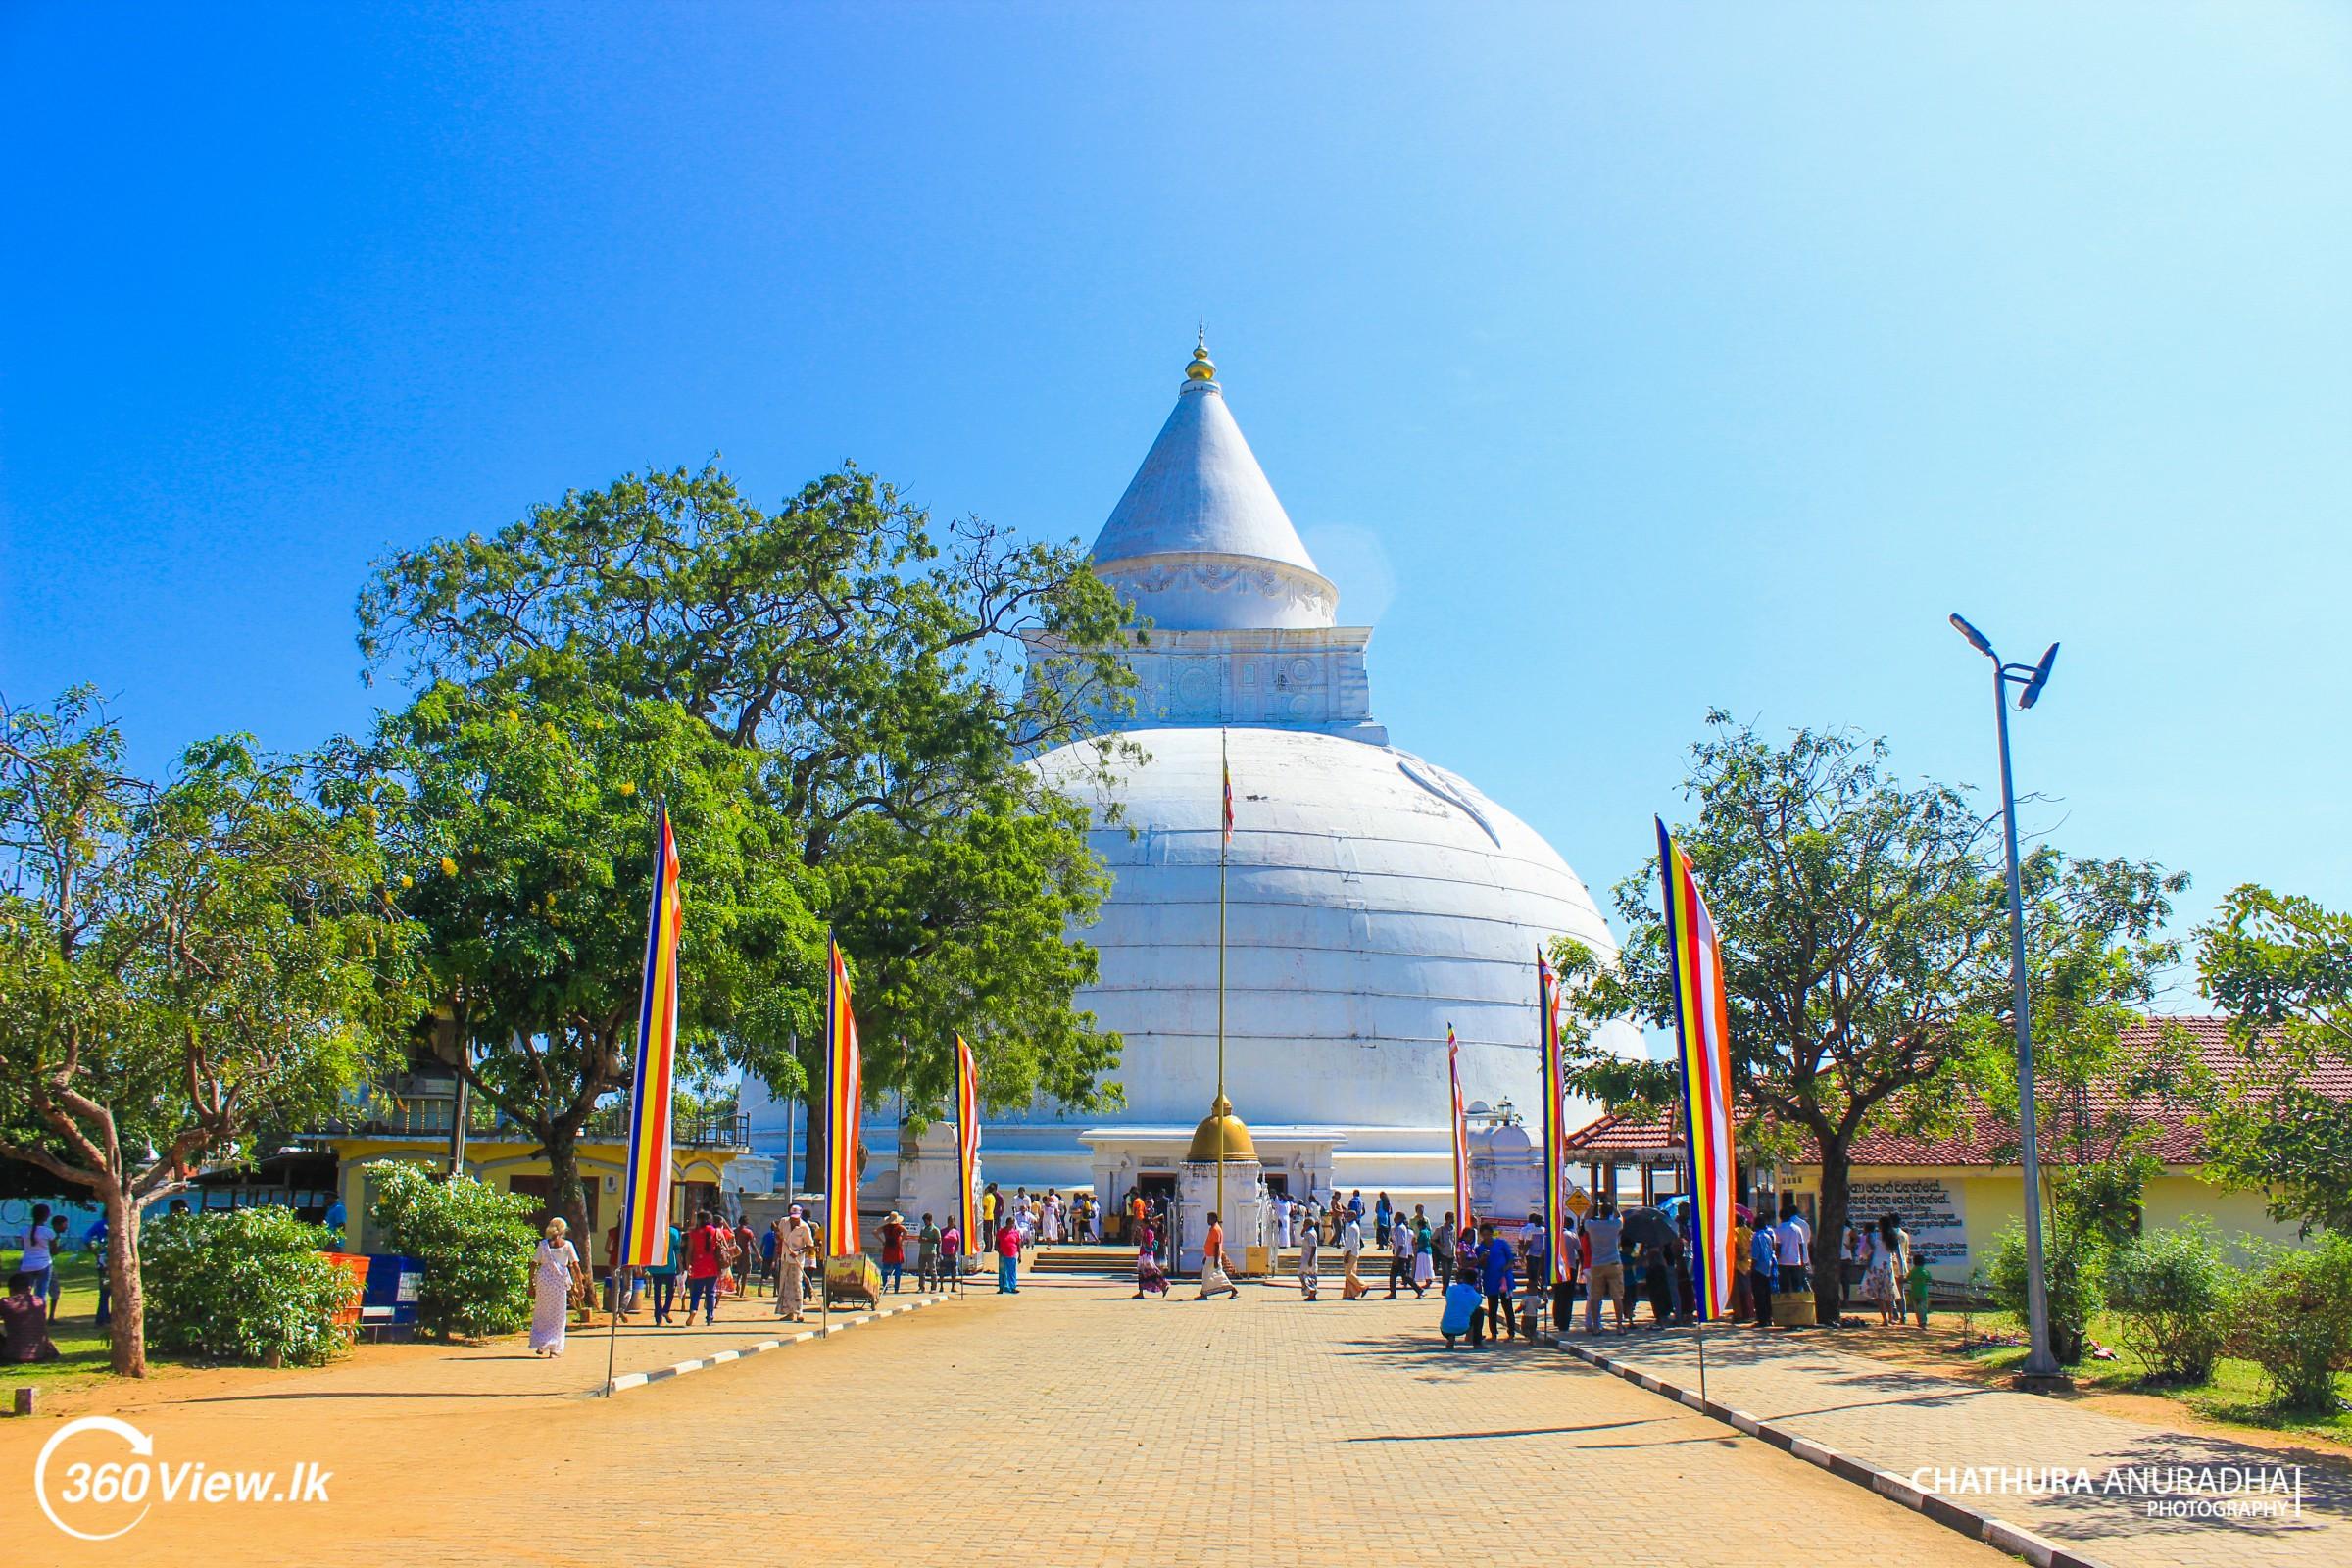 Tissamaharama Raja Maha Vihara-The Spherical Stupa in Ruhuna